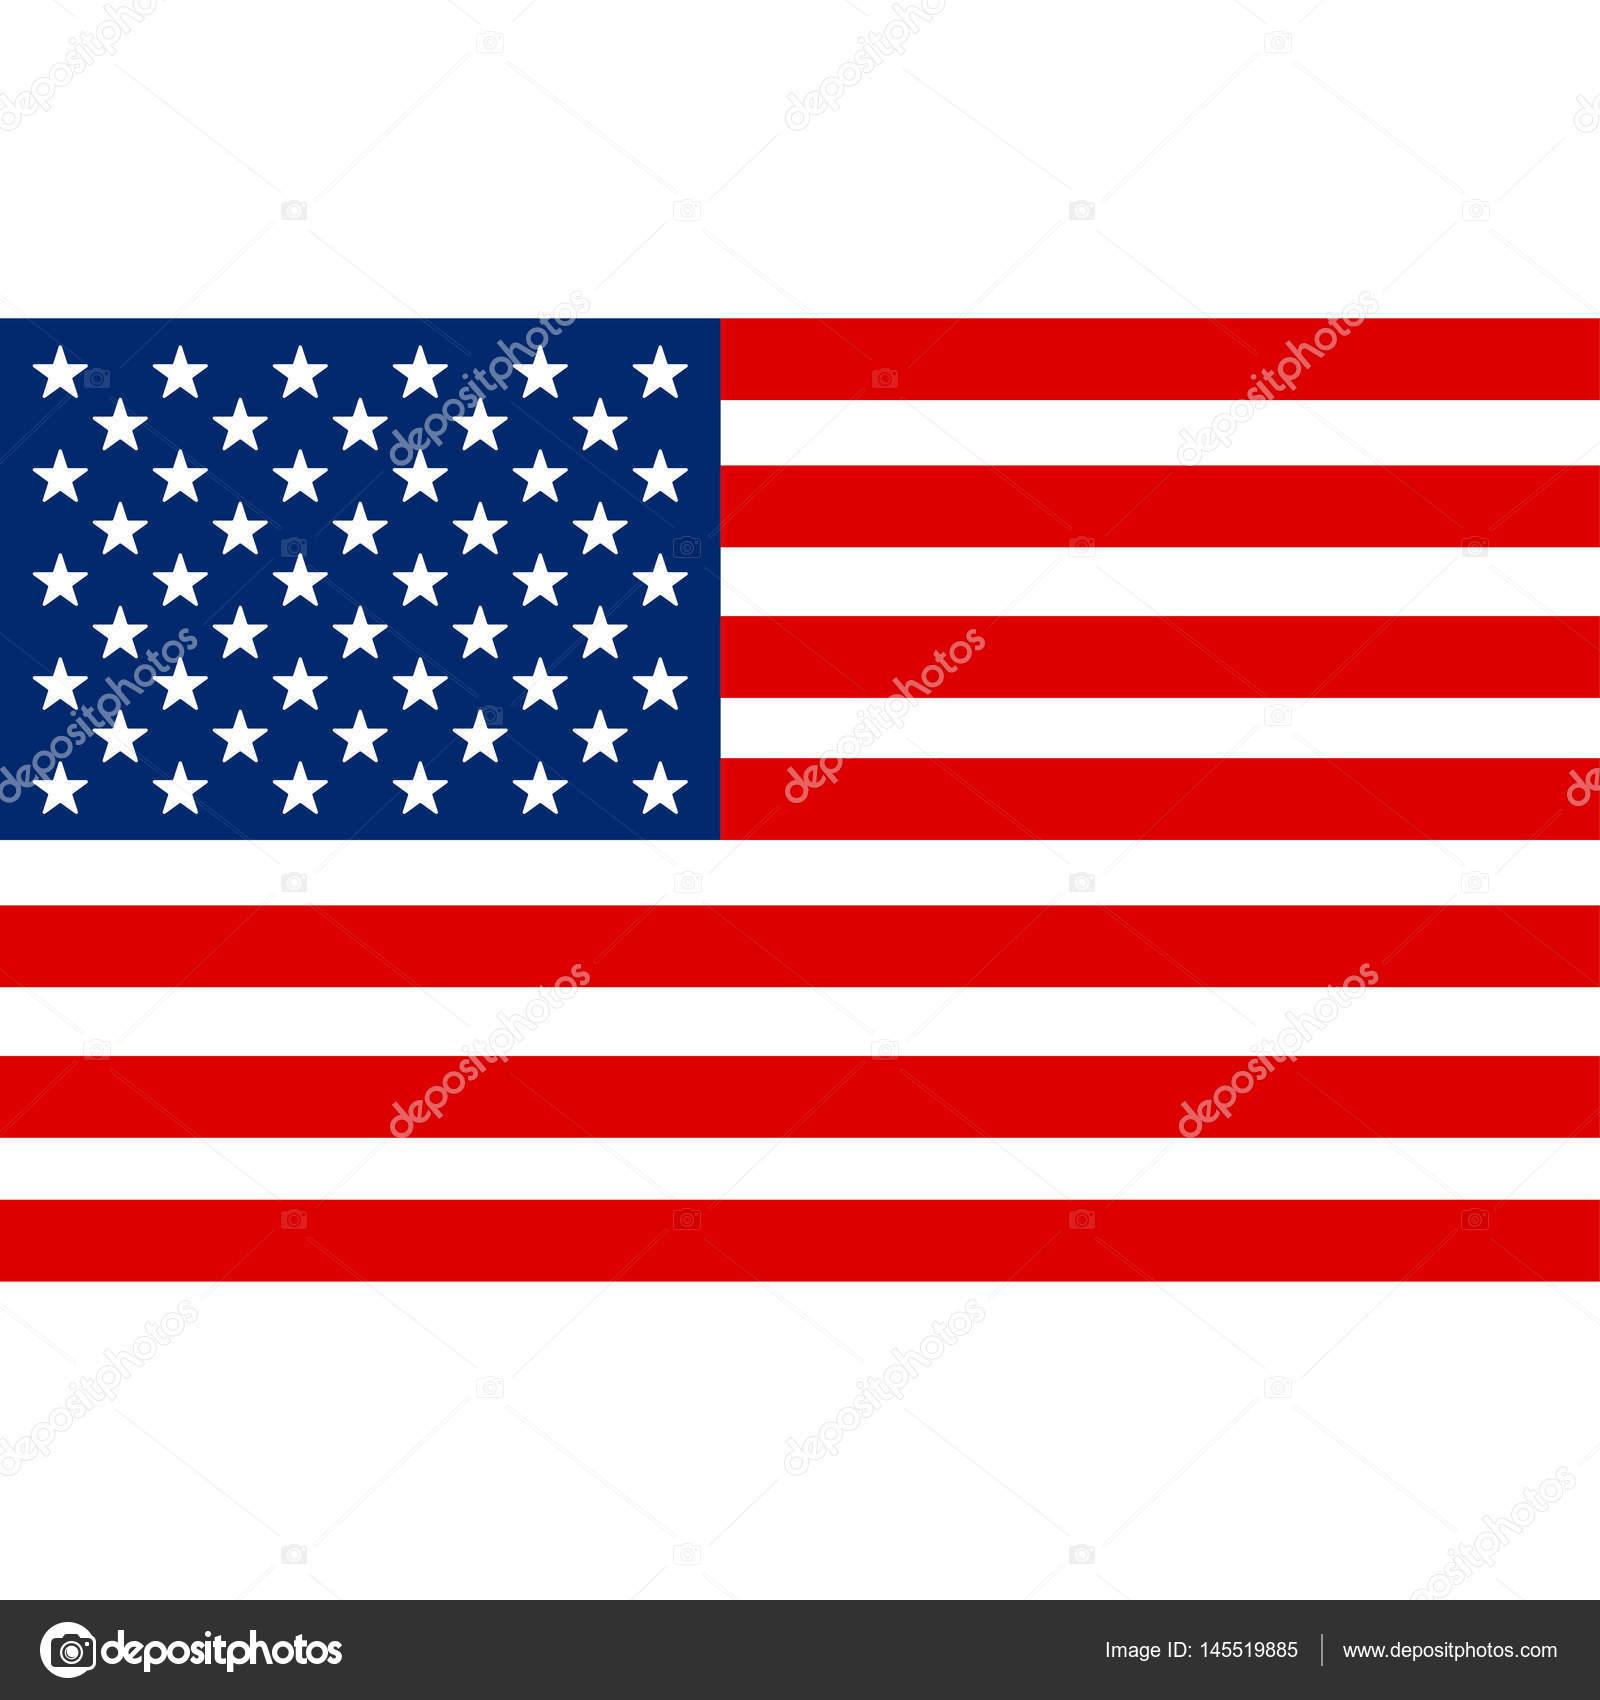 American flag image. American flag drawing JPG. American flag ...